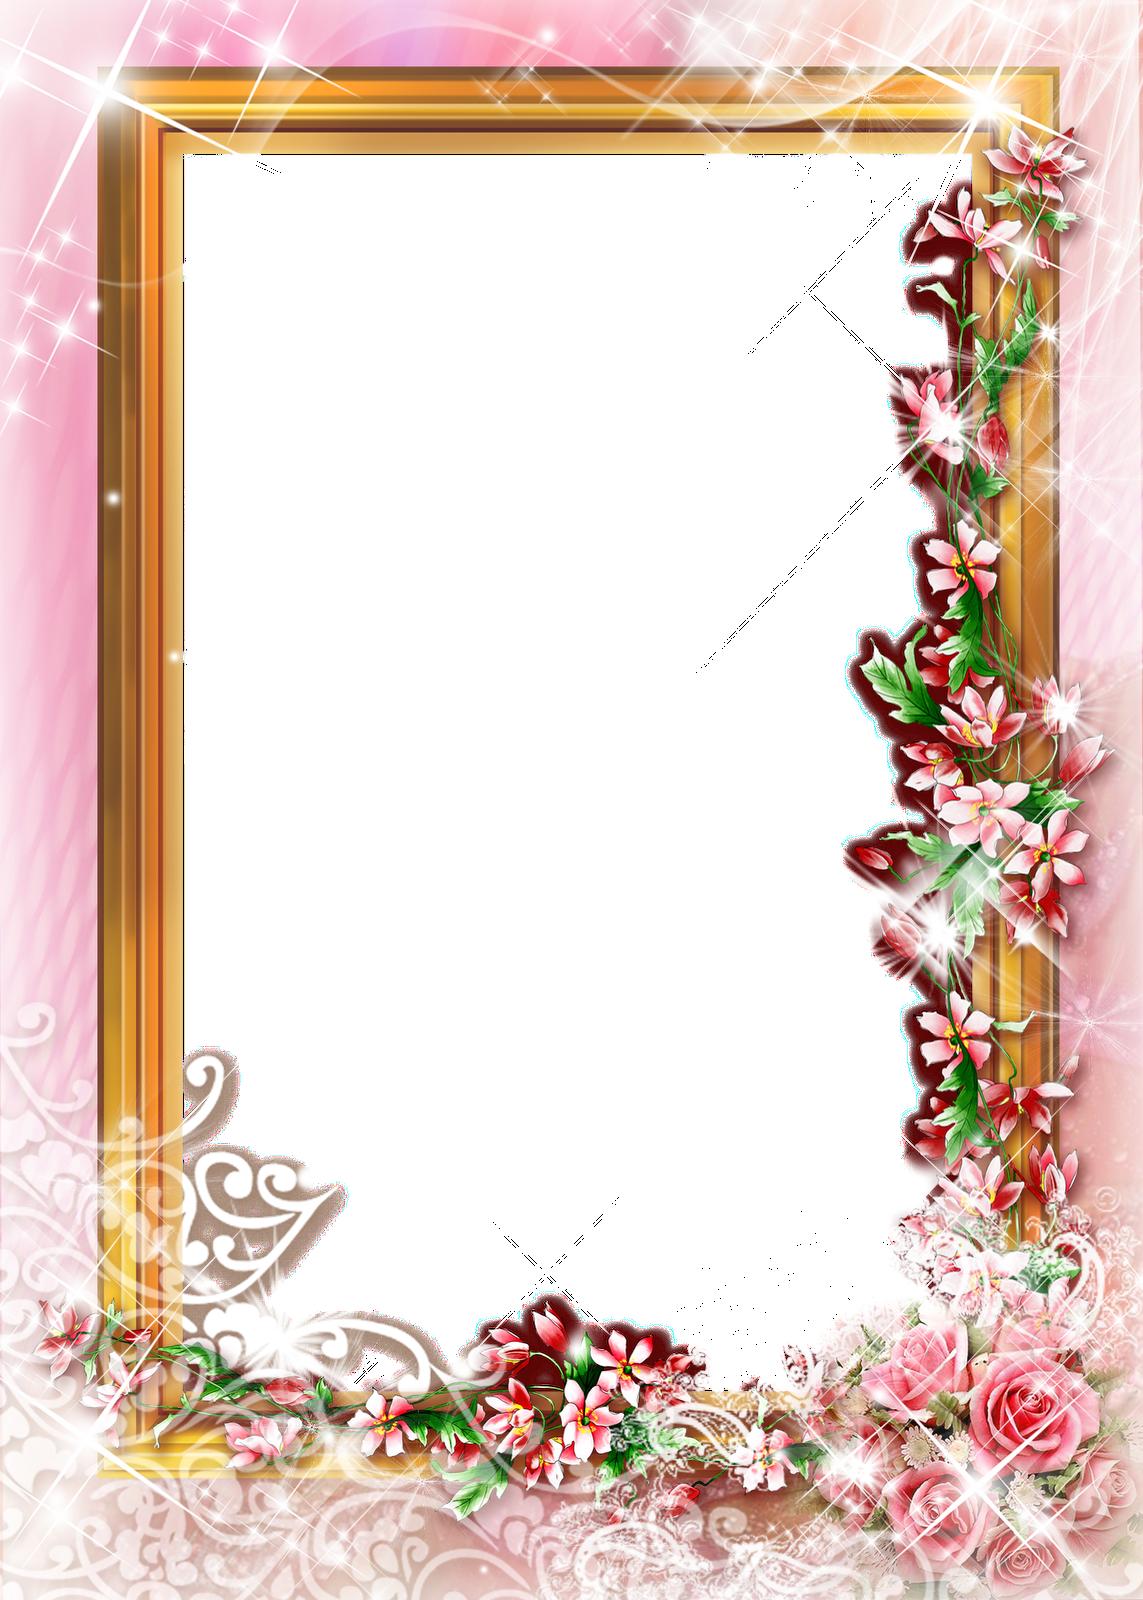 Marcospng fotos karenliz marcos de flores png - Marco fotos pared ...